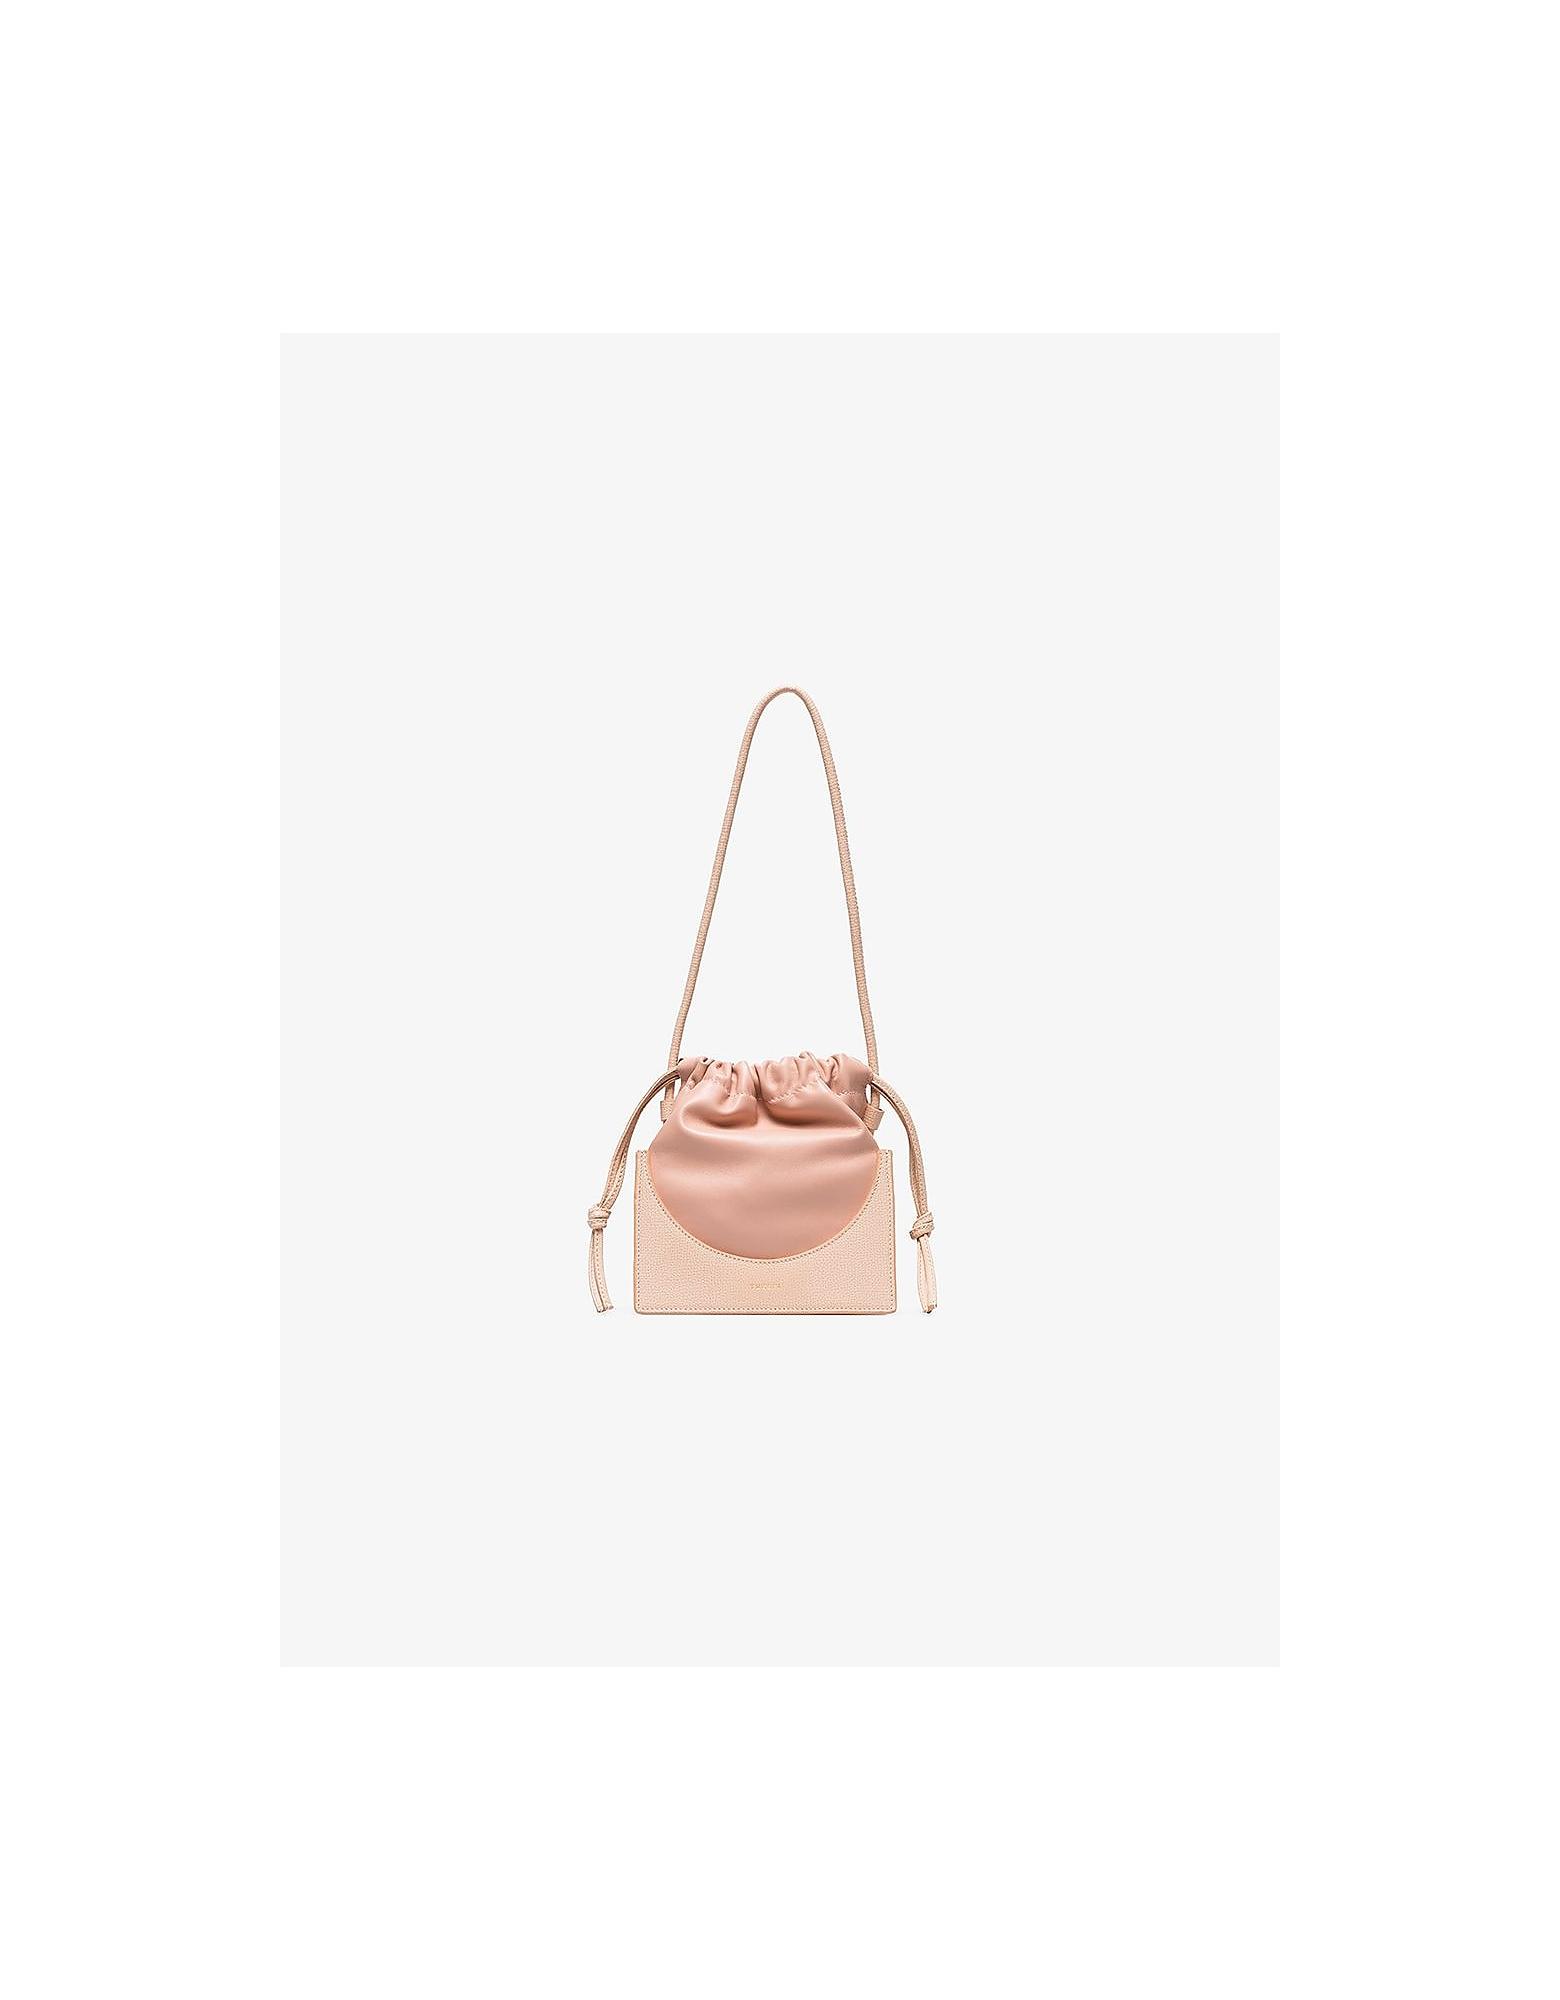 Yuzefi Designer Handbags, Pink Pouchy Leather Mini Bag